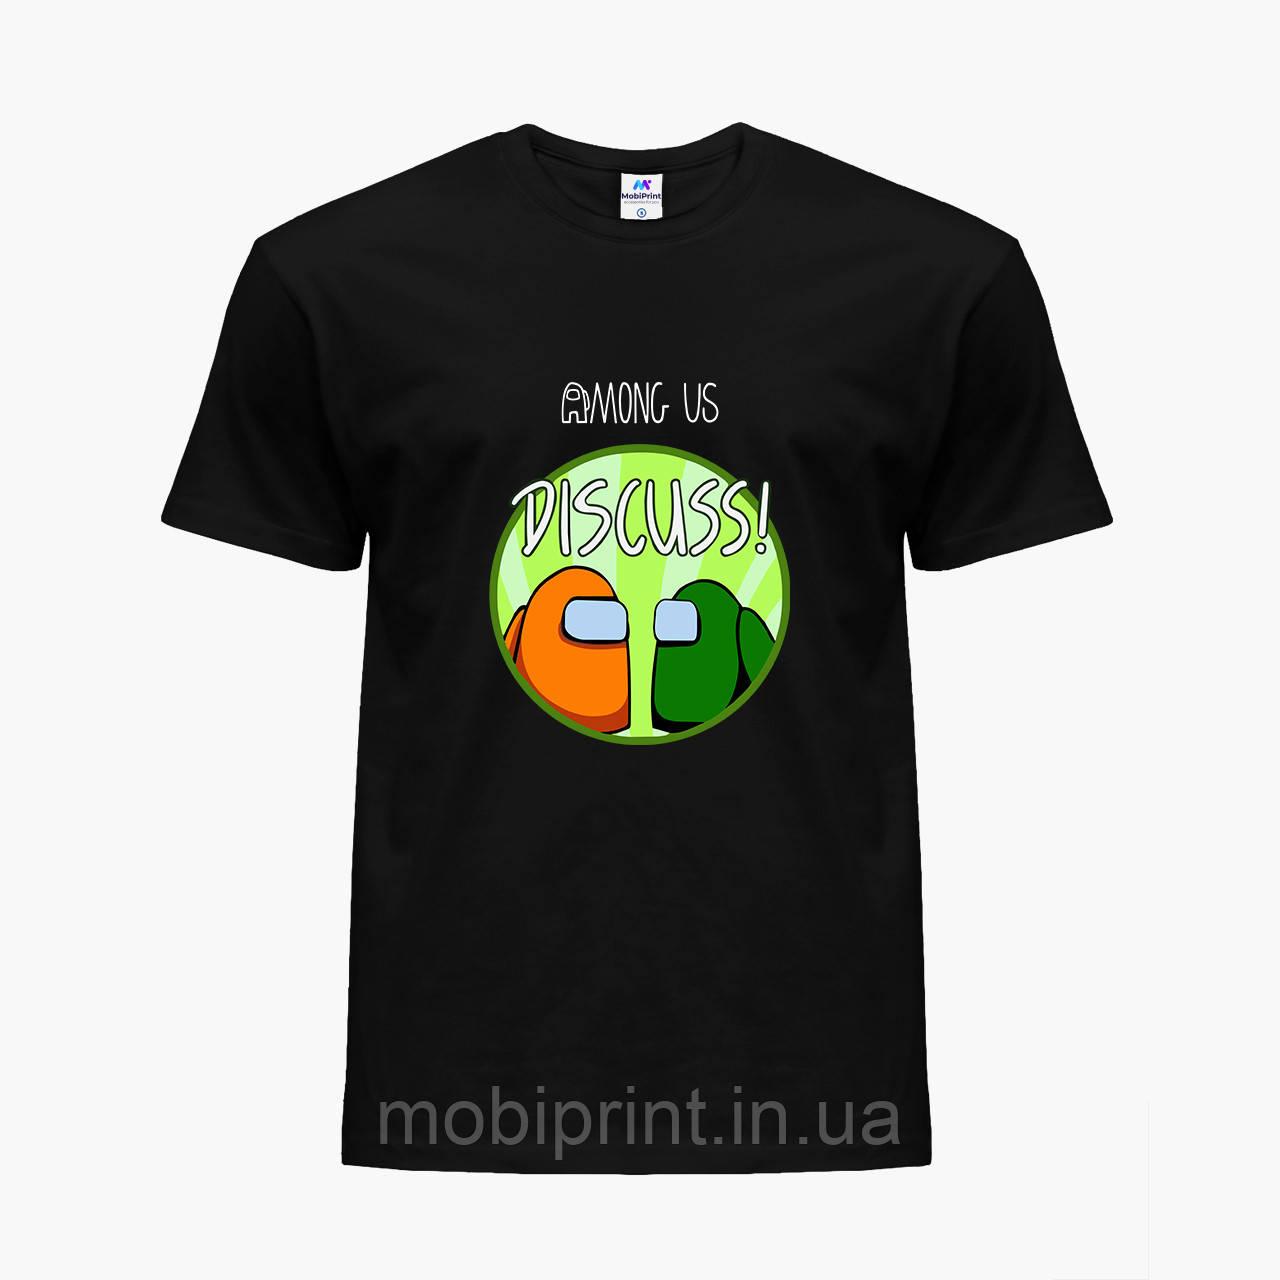 Дитяча футболка для хлопчиків Амонг Ас (Among Us) (25186-2588) Чорний